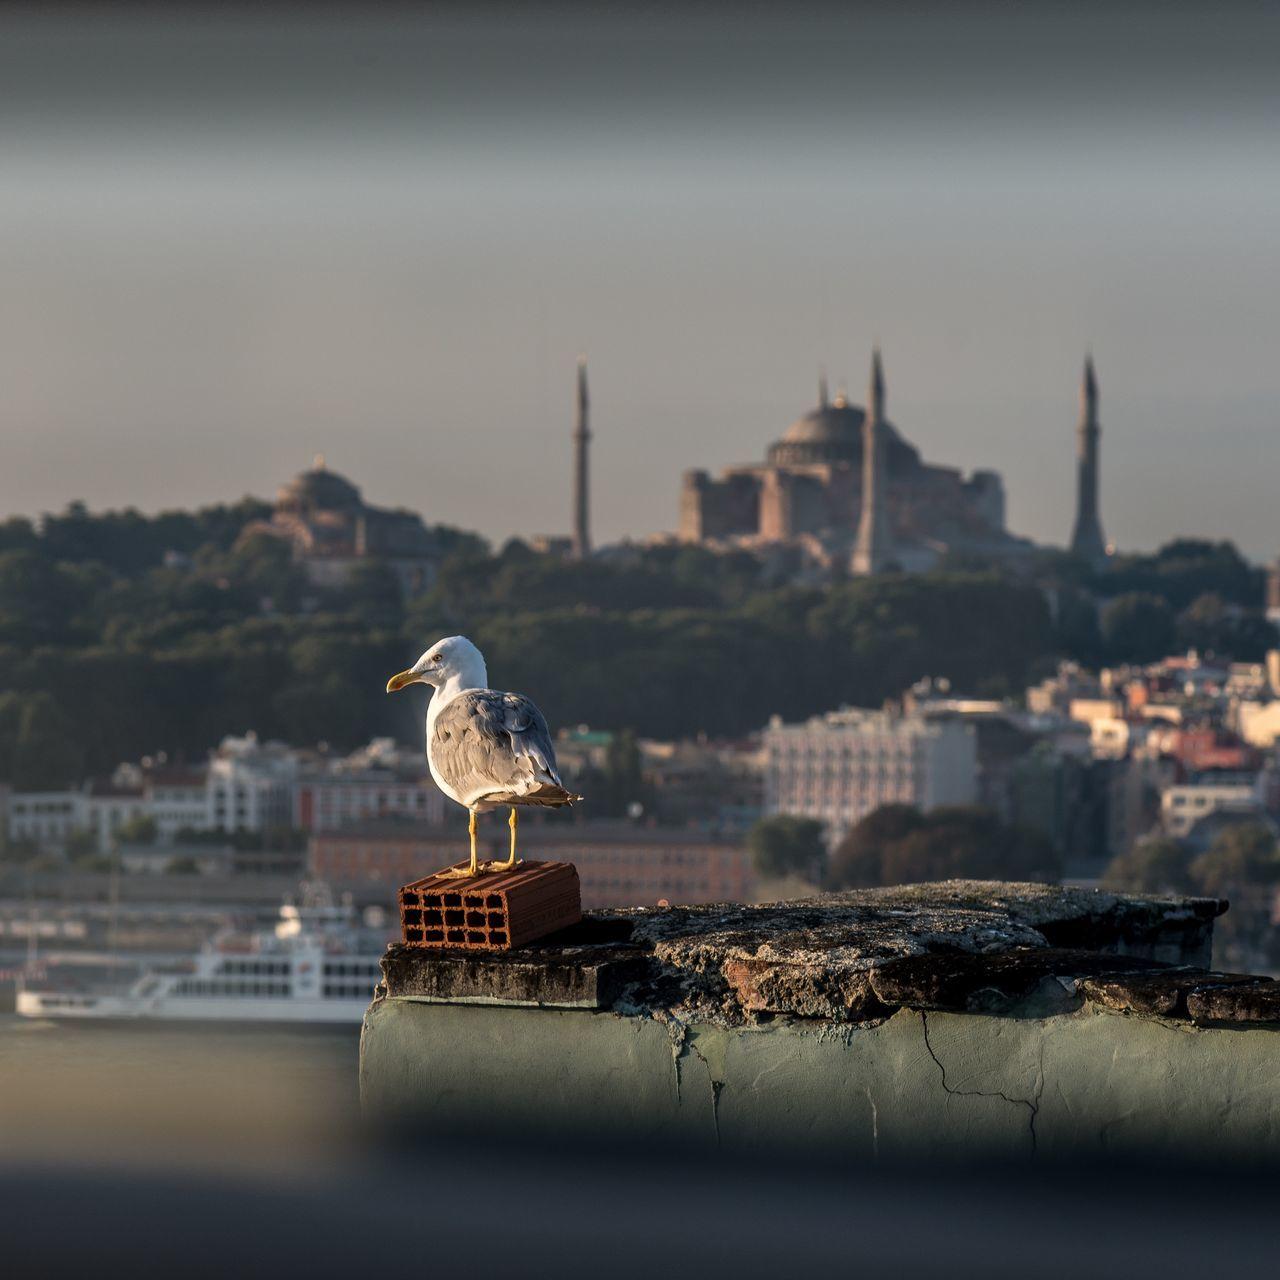 Bird Mosque No People Seagull Selective Focus Tourism